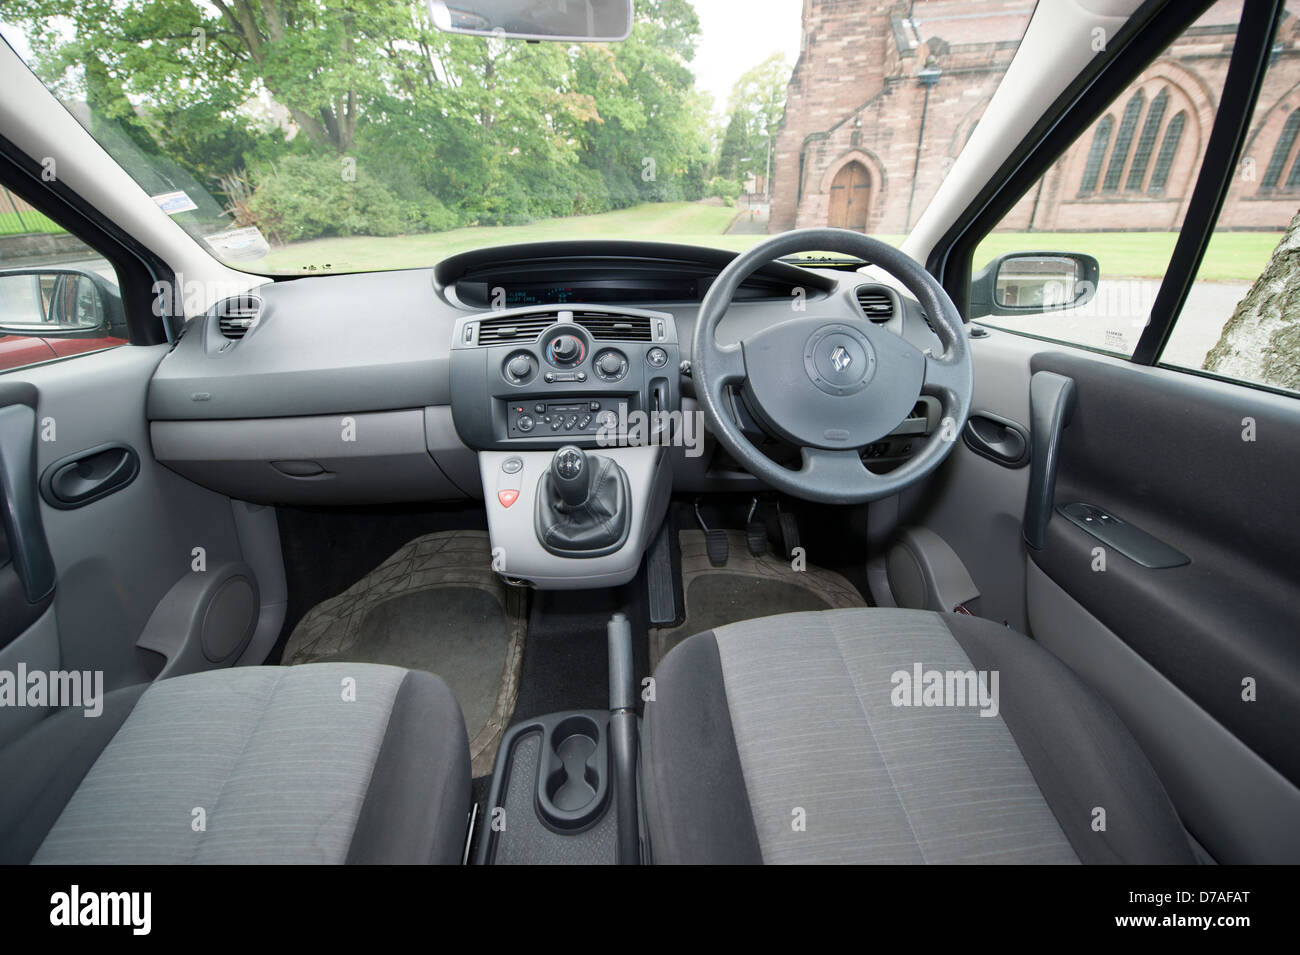 Inside interior of renault scenic car stock photo for Interior renault scenic